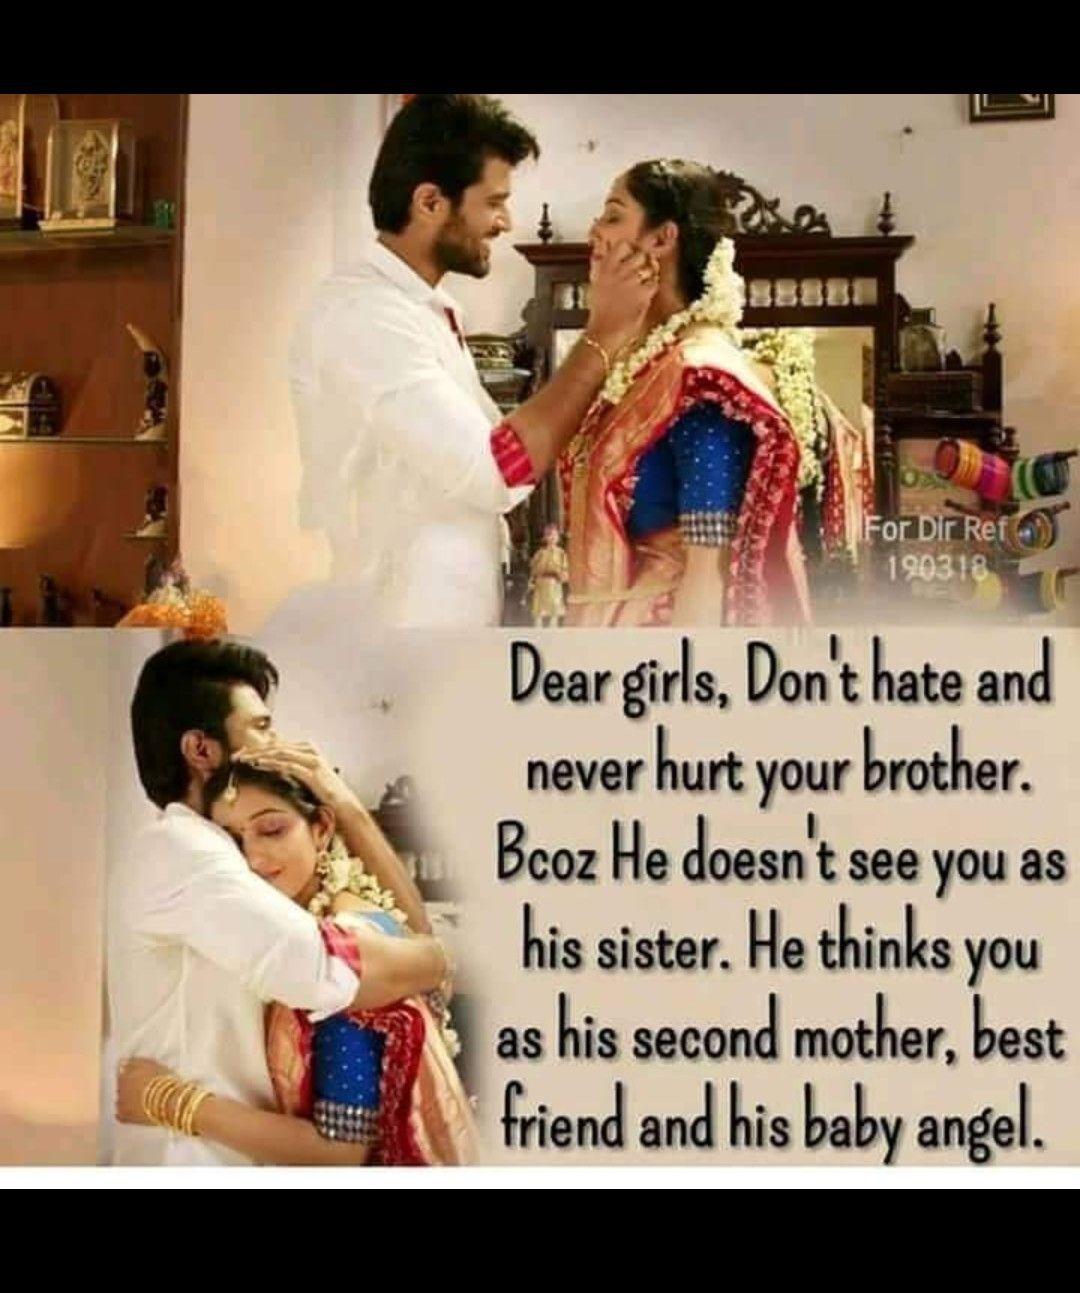 Pin By Sneha Koli On Thoughts Cute Sister Quotes Brother Sister Quotes Sister Quotes Funny